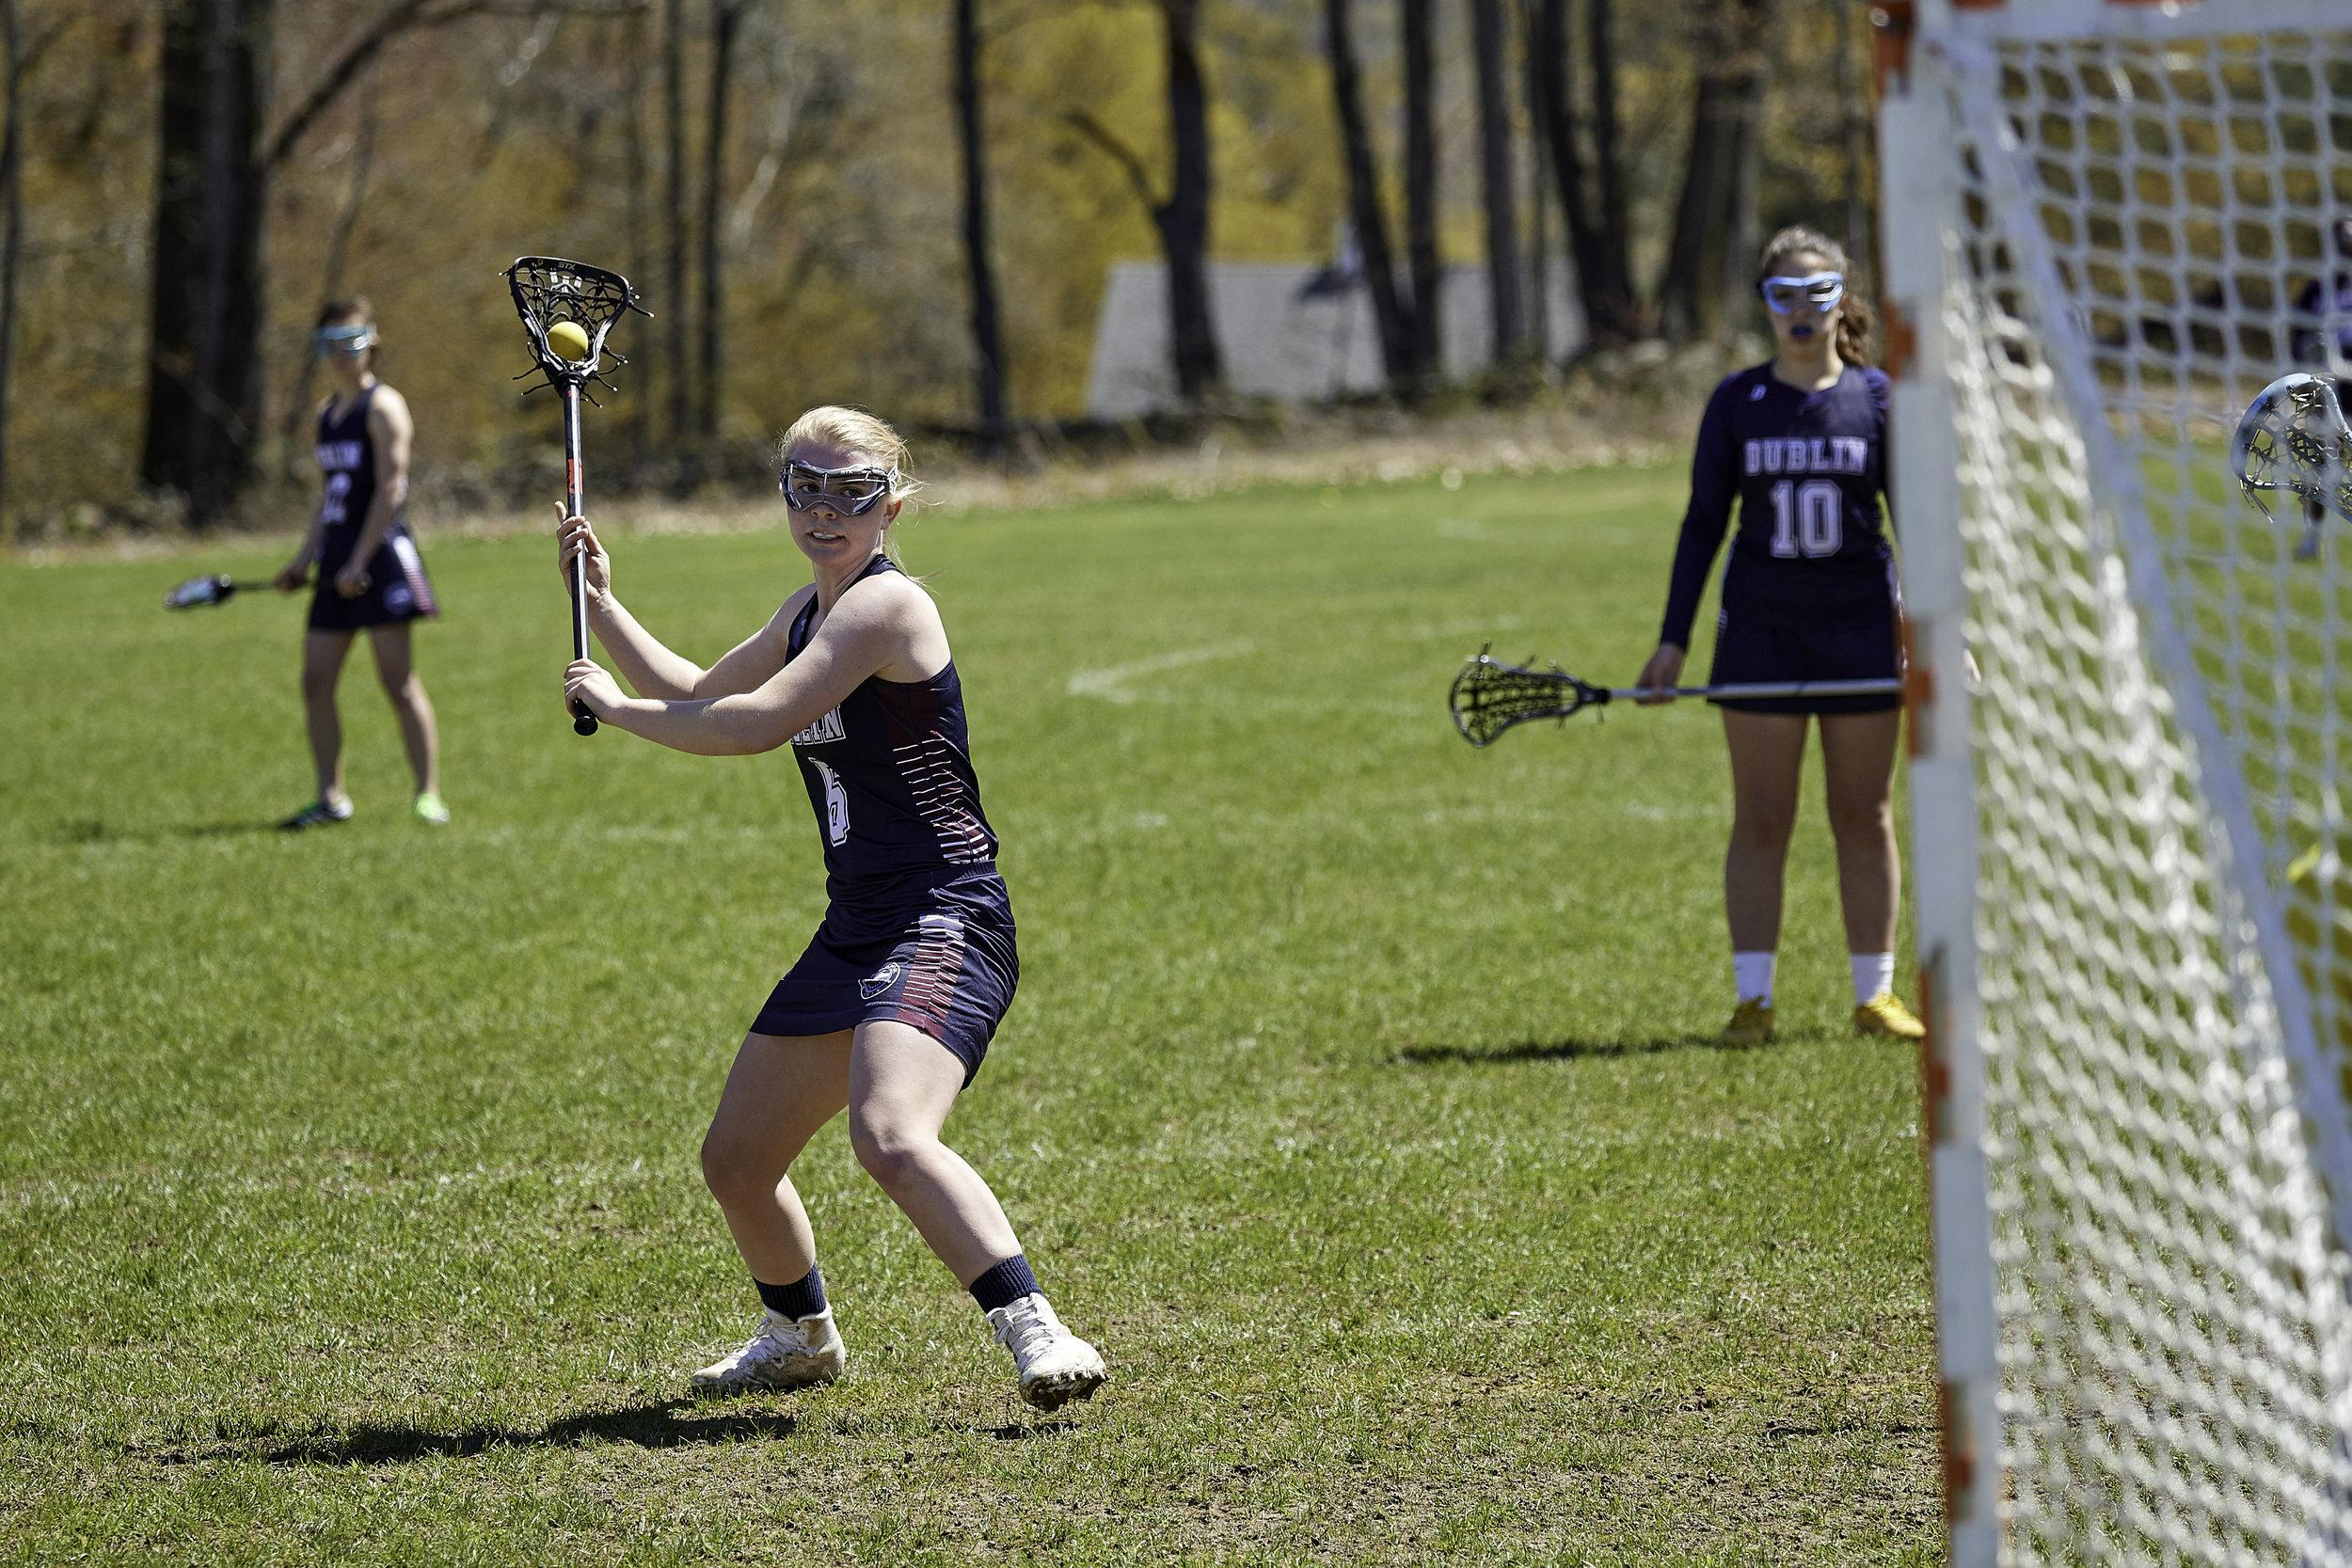 Girls Lacrosse vs. Stoneleigh Burnham School - May 11, 2019 - May 10, 2019193147.jpg